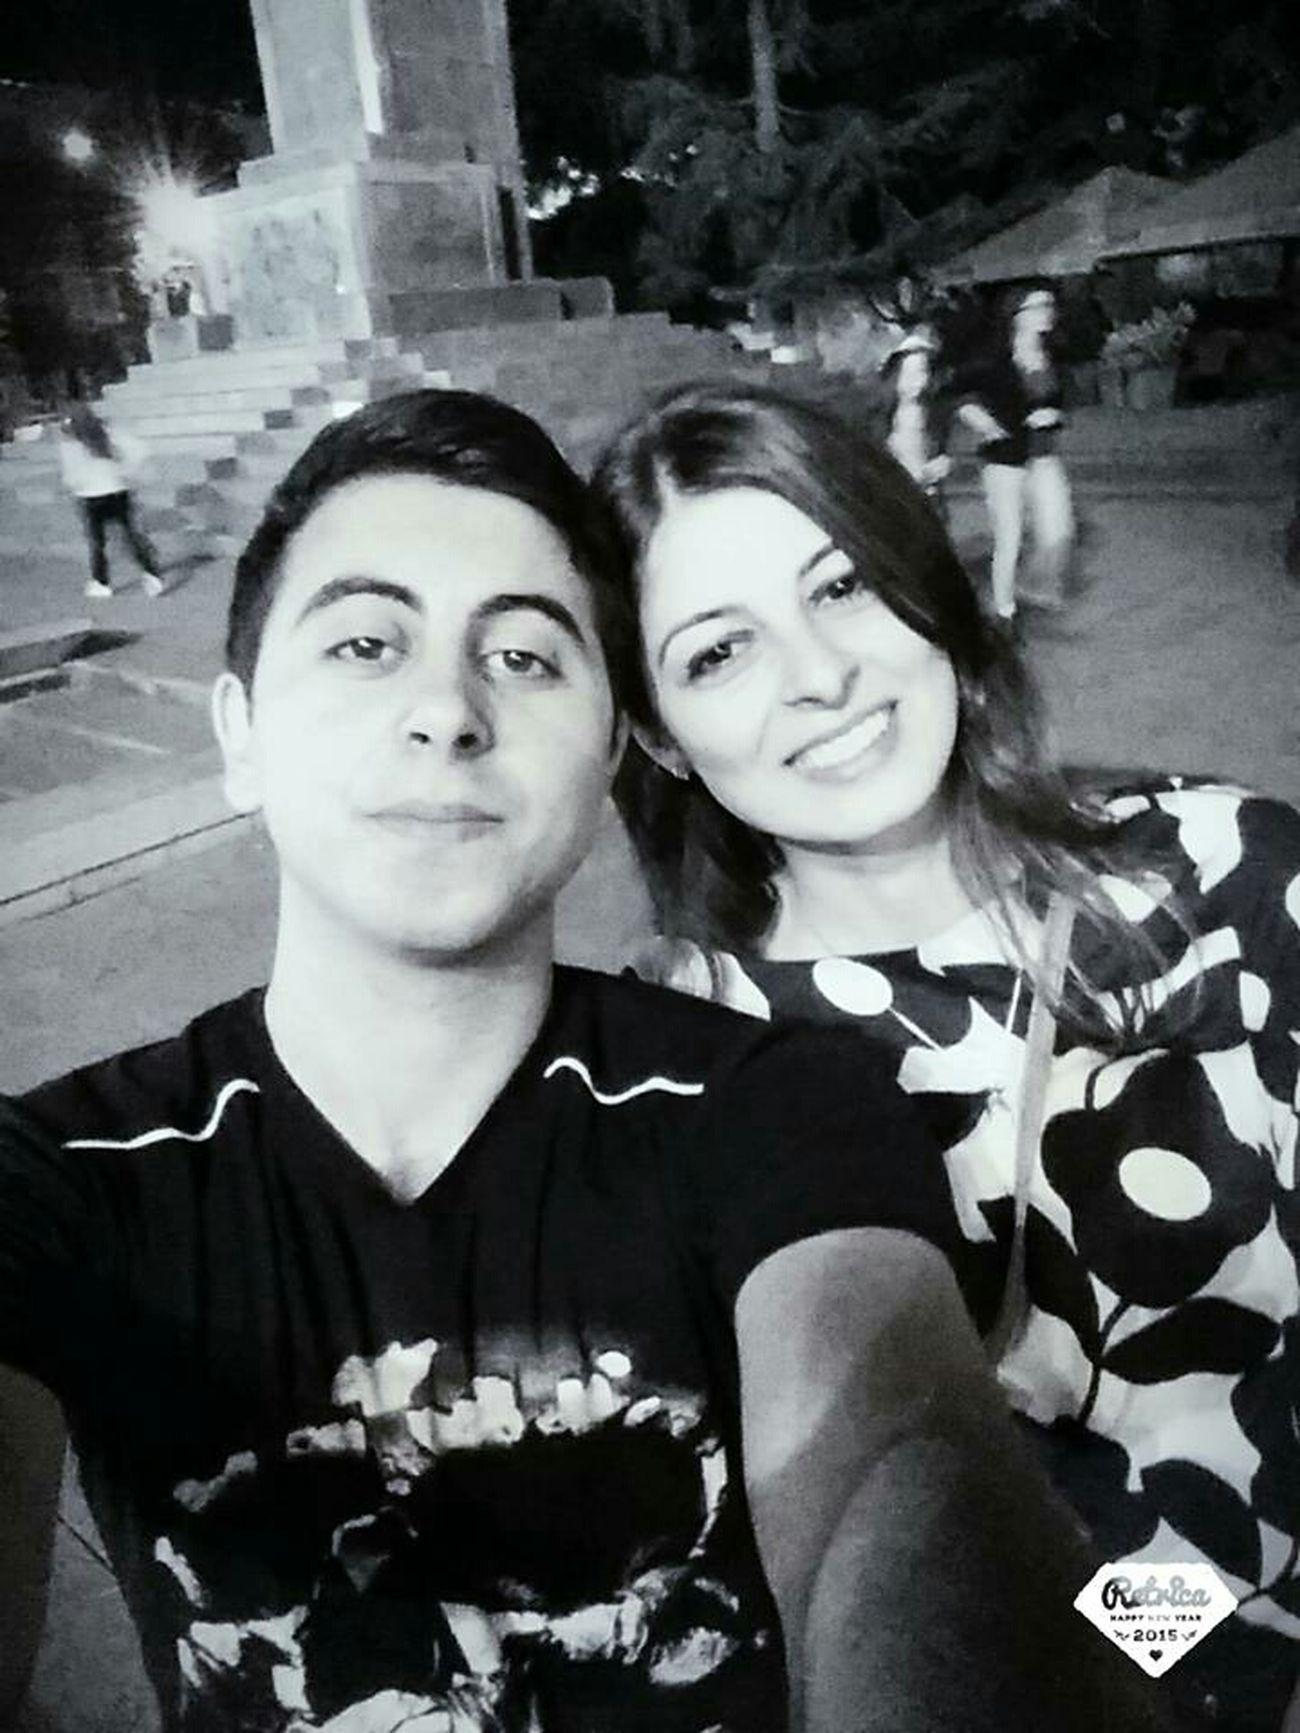 Aram4iiik Aramchiiik Aram Maroyan Smt Tbilisi Georgia Hello World Aram Samtredia My Sister ❤